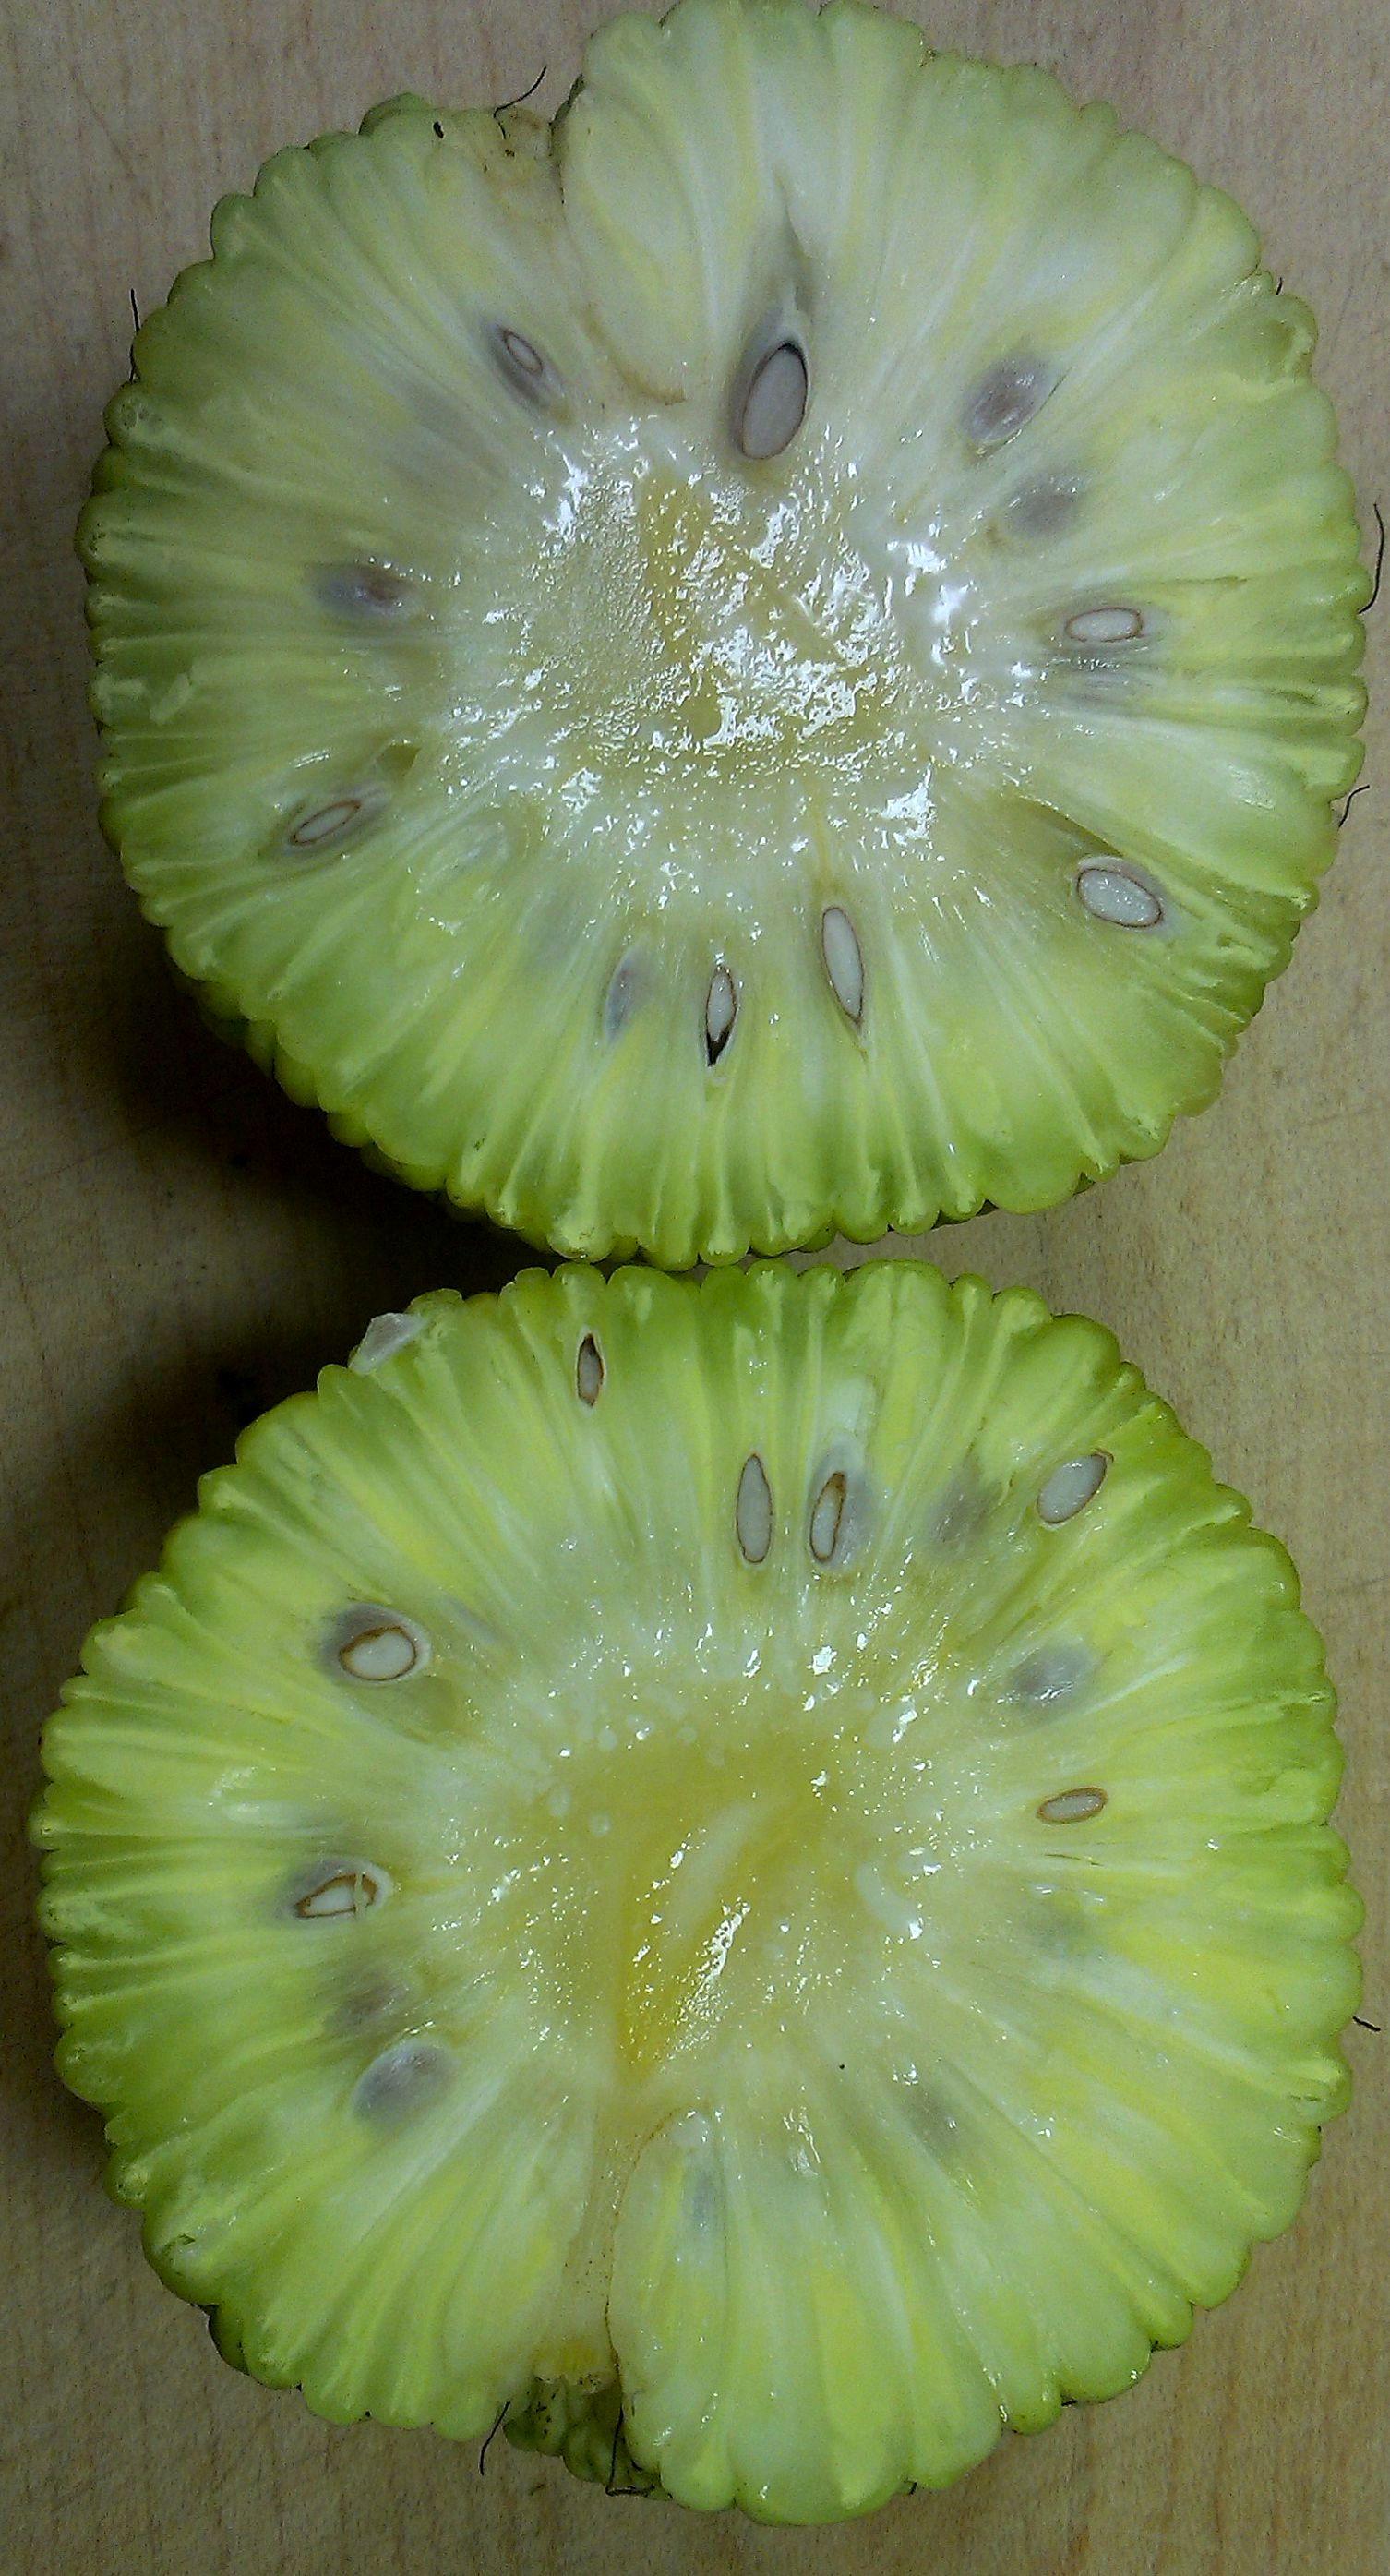 Maclura pomifera (Maklura pomarančová)